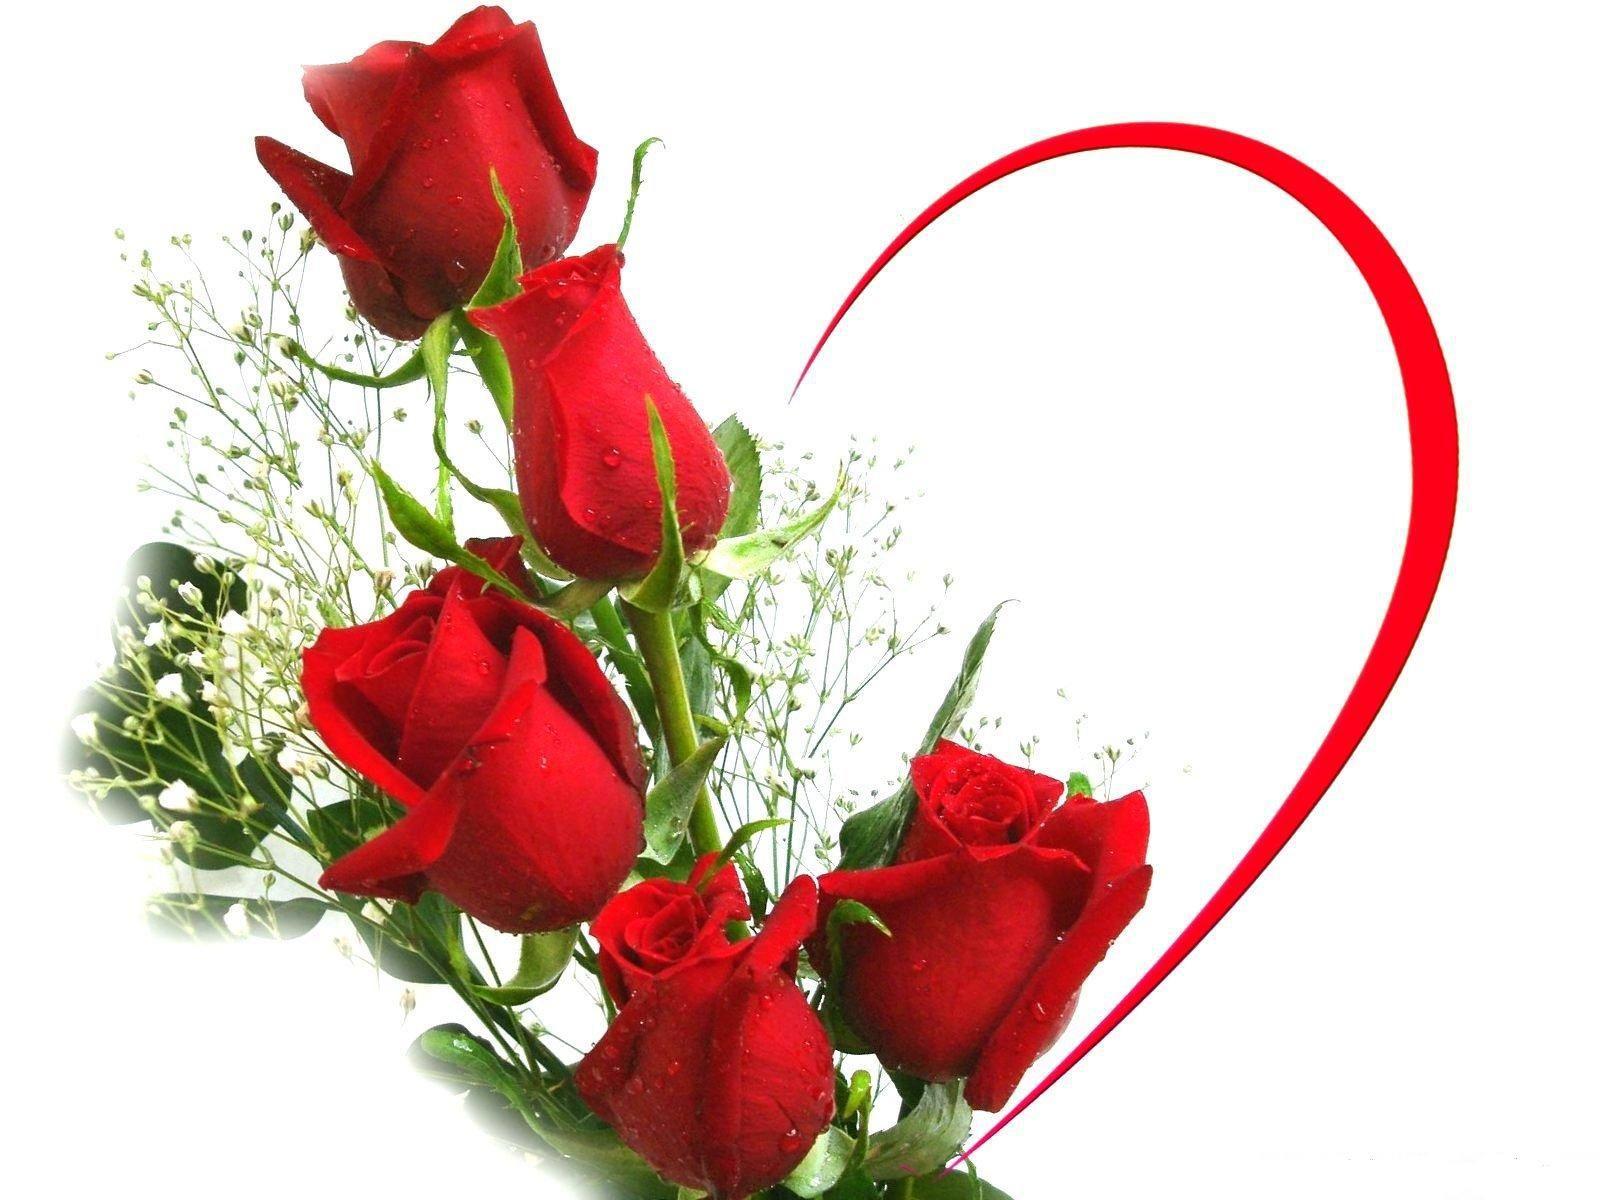 Pin By Wendy Sengstock On Coeur Love Red Roses Wallpaper Love Rose Flower Beautiful Love Flowers